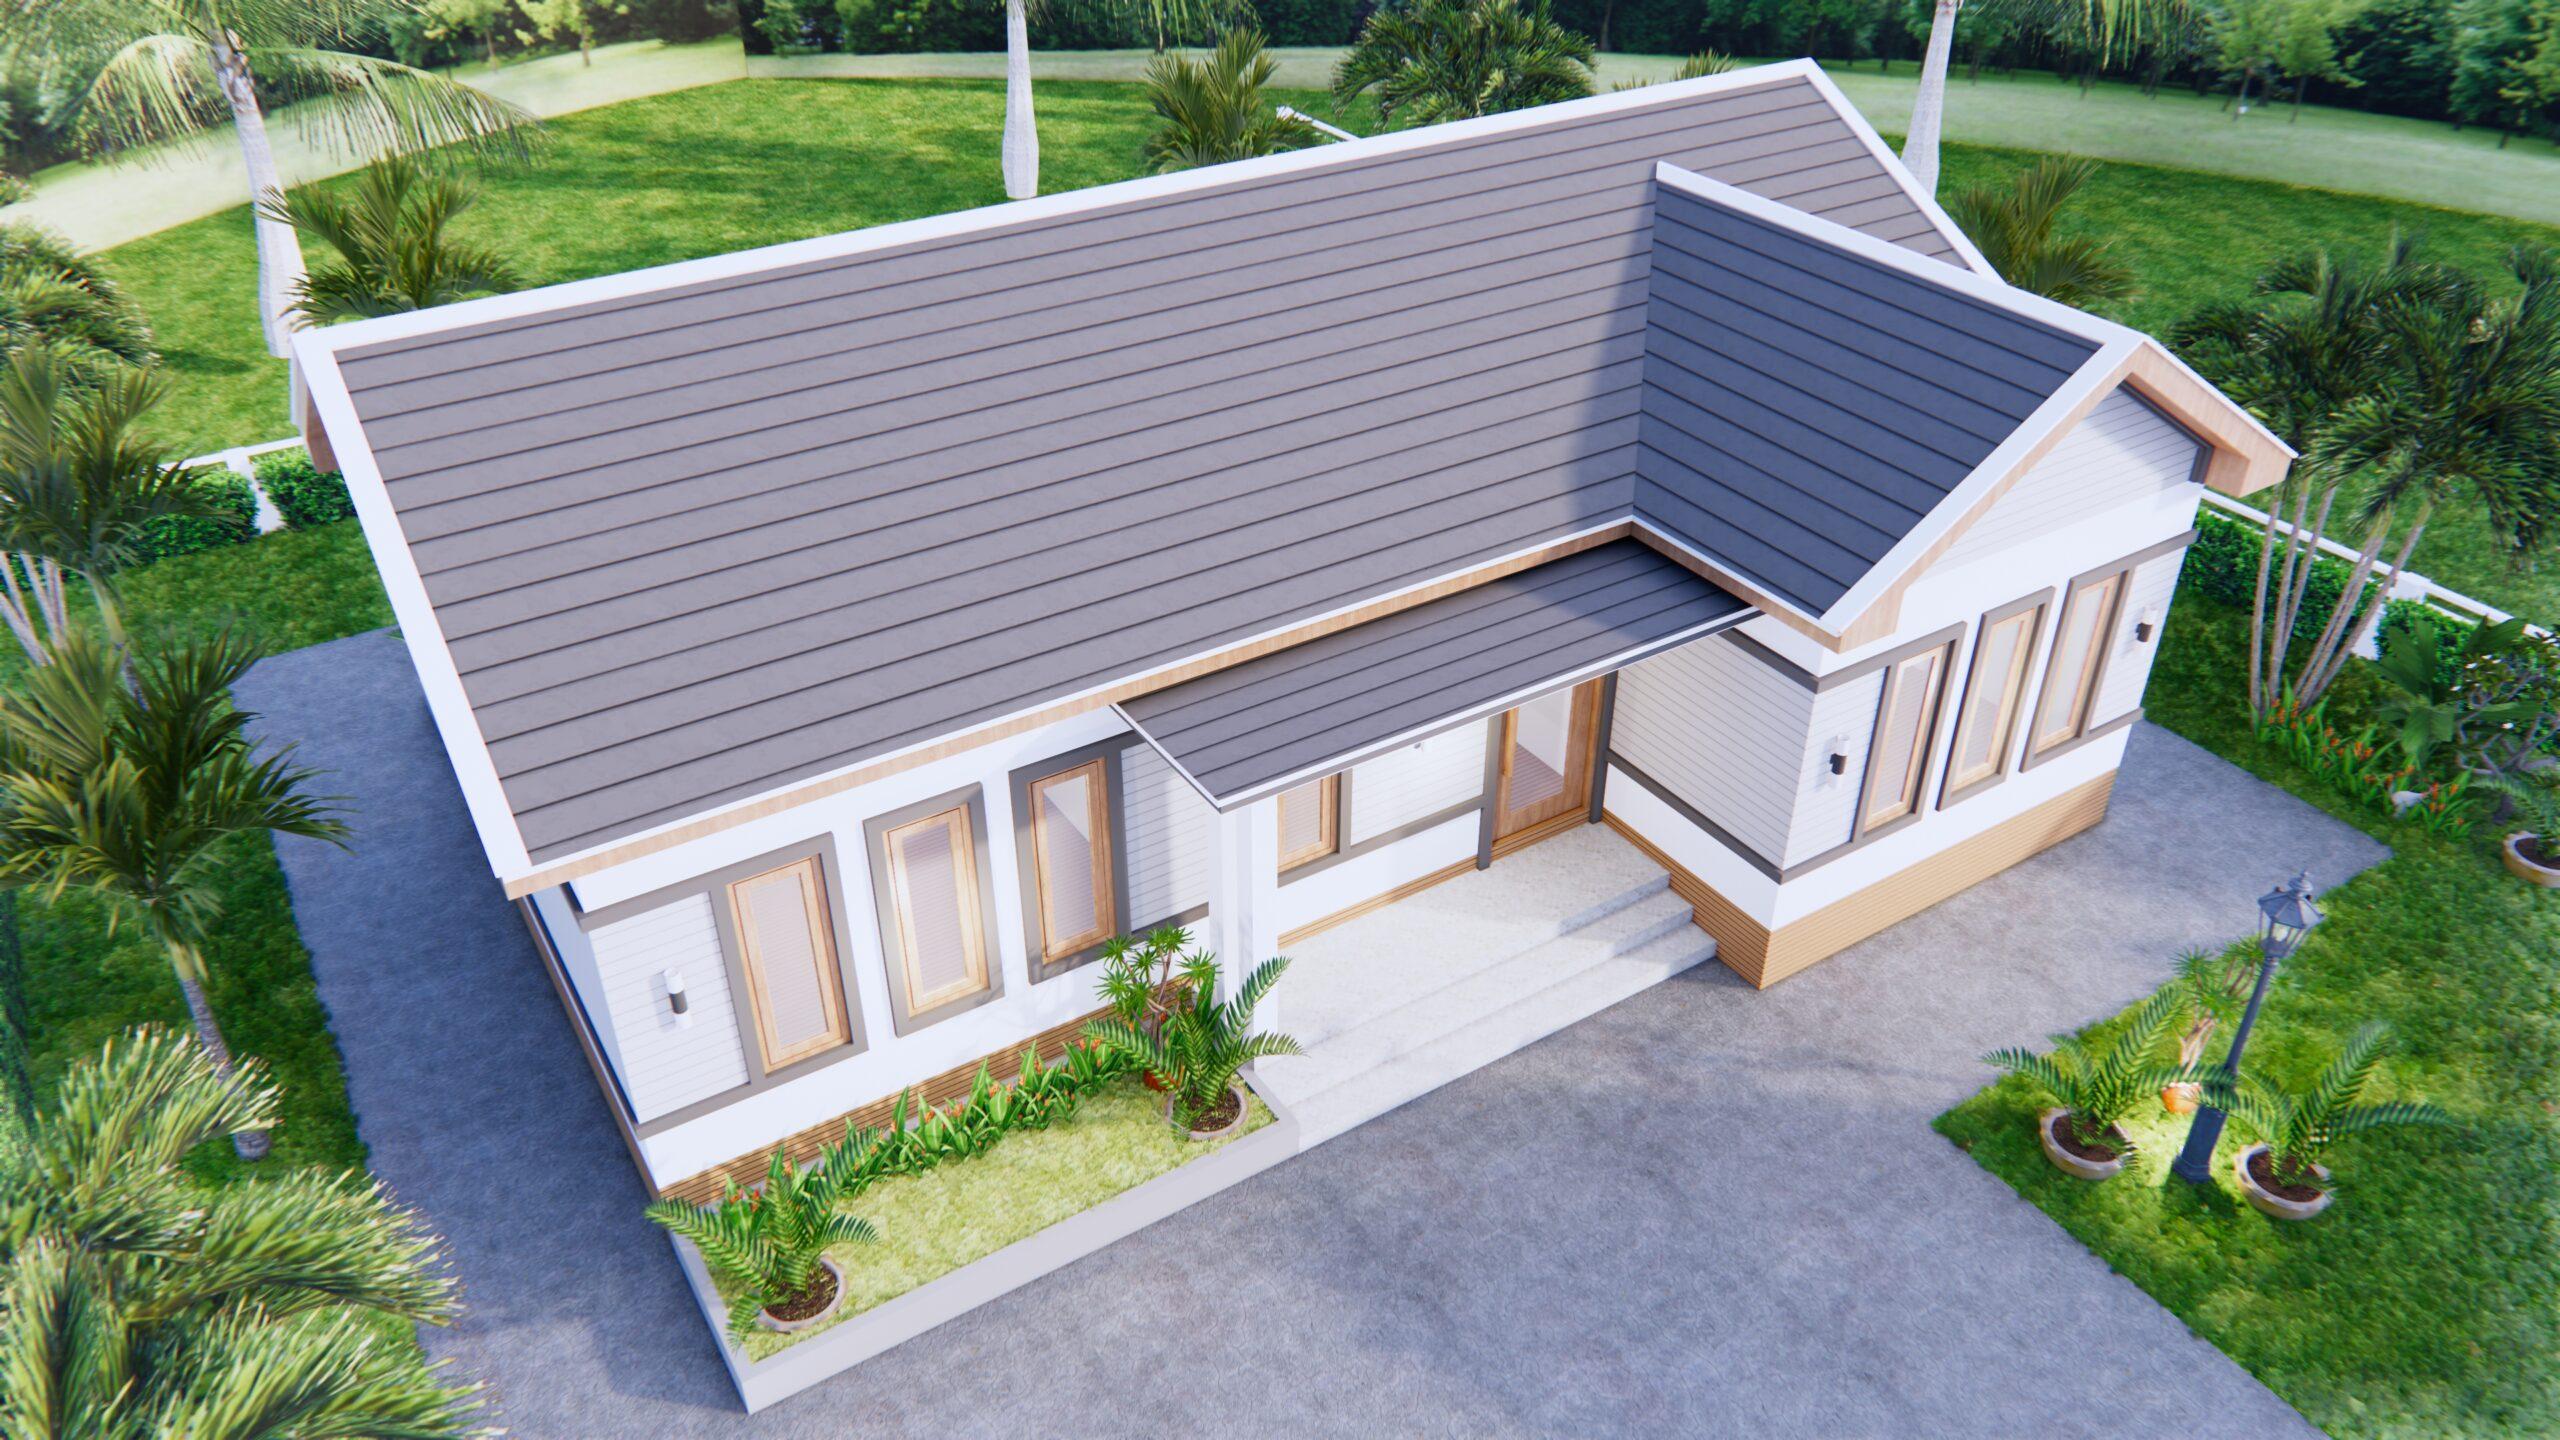 Luxury House Plans 12x8 Meters 40x26 Feet 3 Beds 4